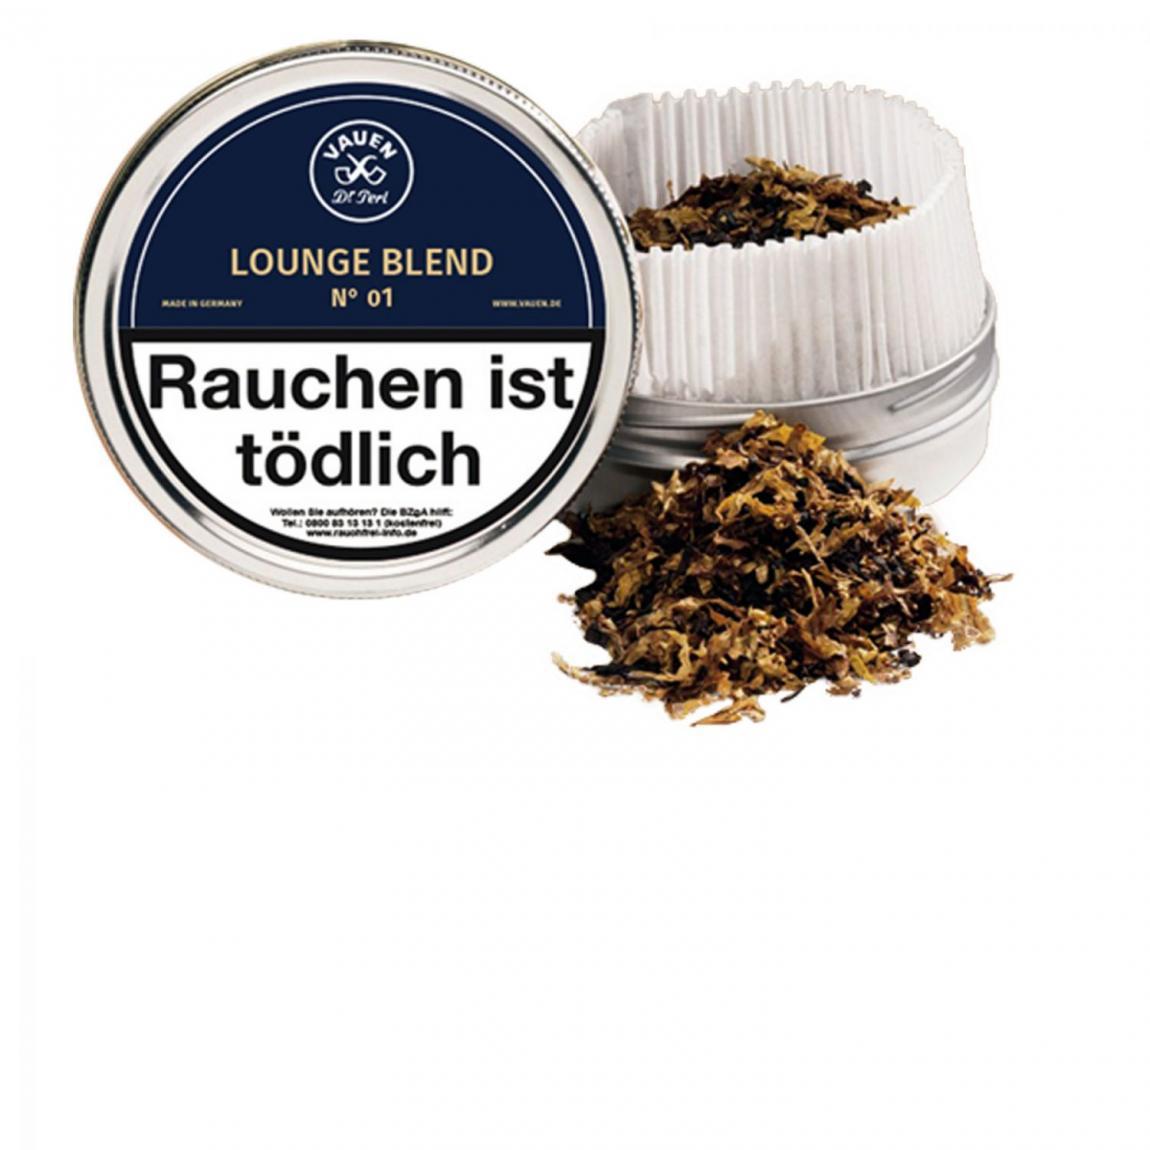 Vauen »Lounge Blend No. 01« 50g Dose